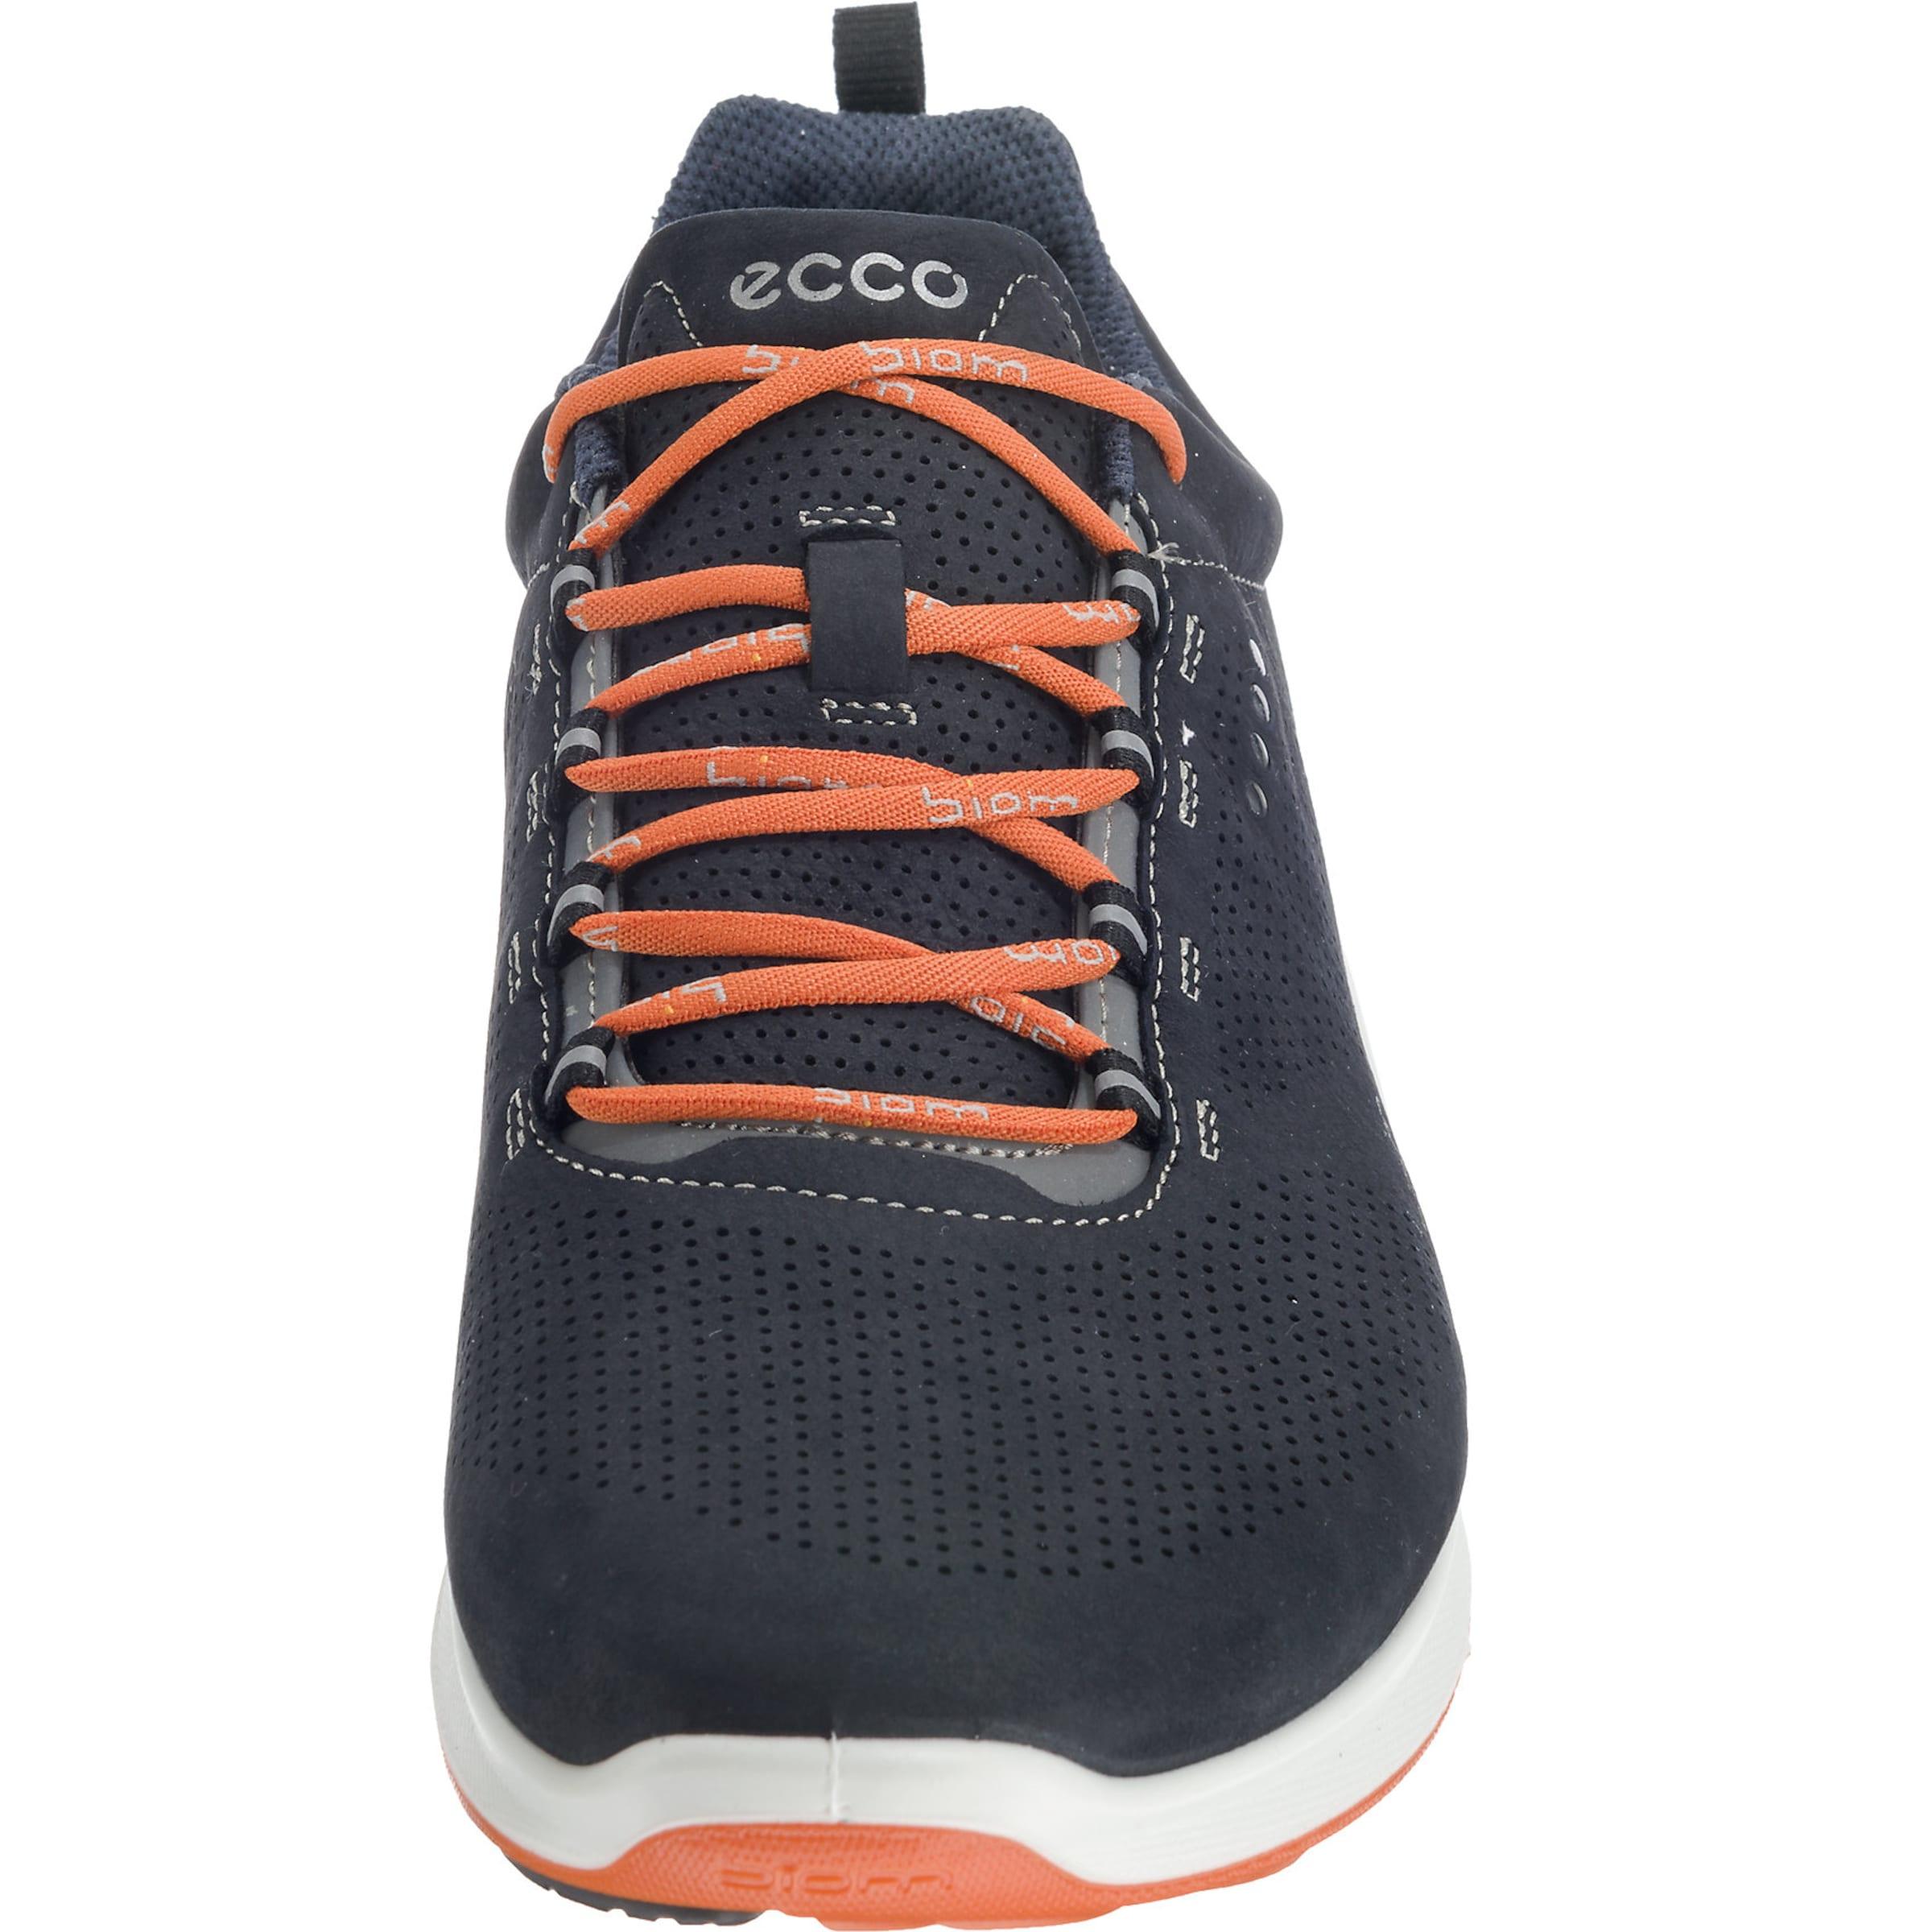 Ecco In NachtblauNeonorange Fjuel' Sneakers 'biom bgyf76Y